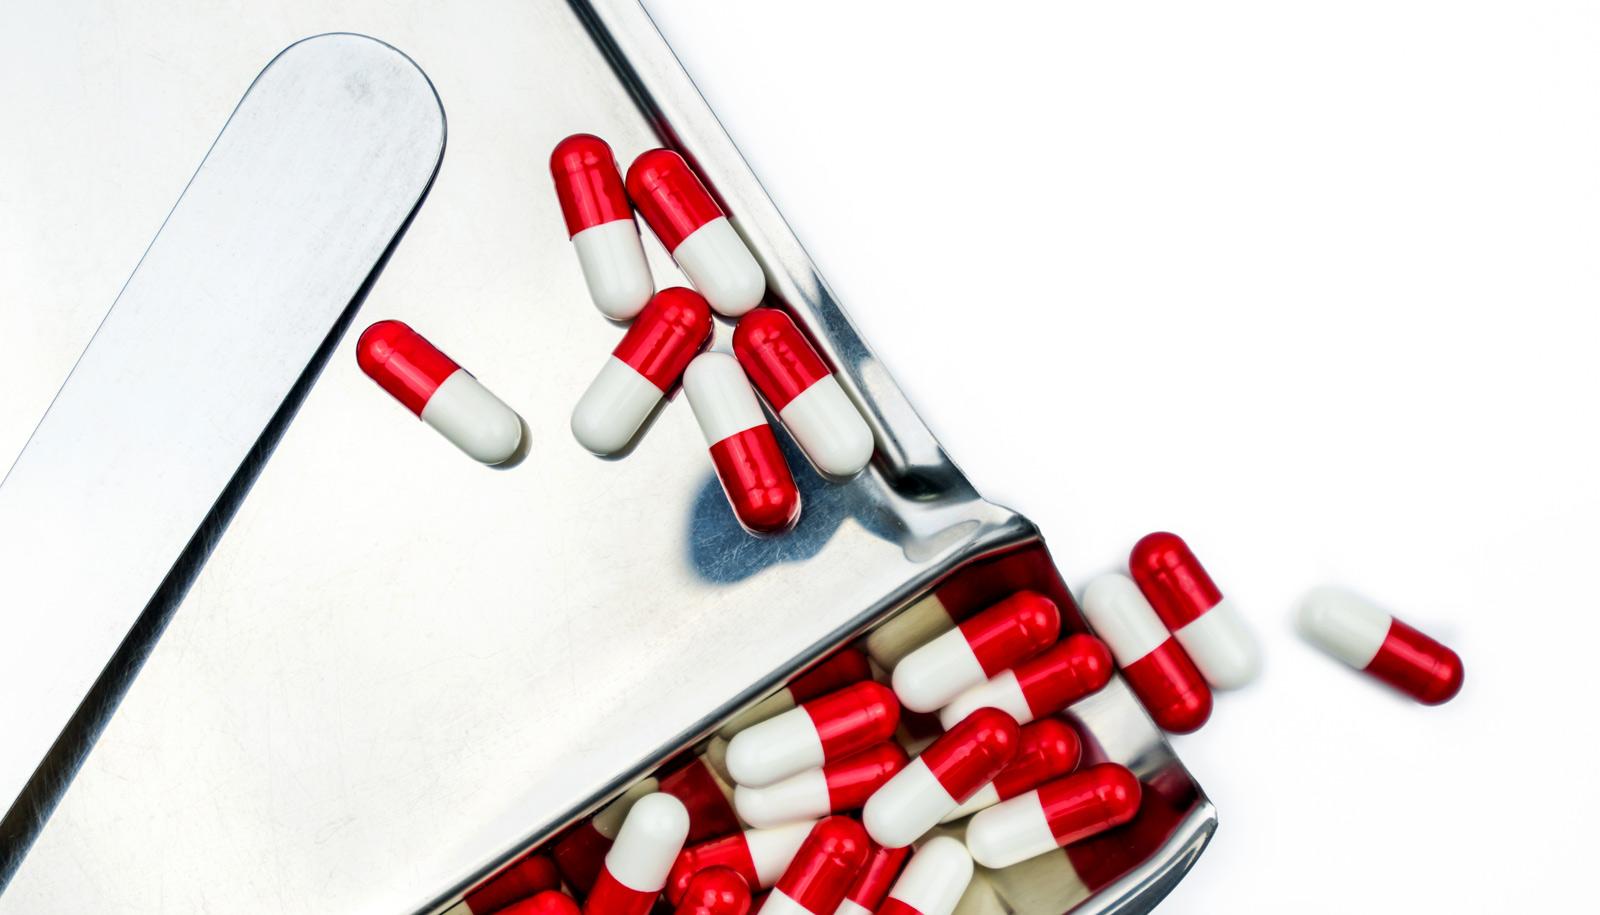 Radiaton Drug combos